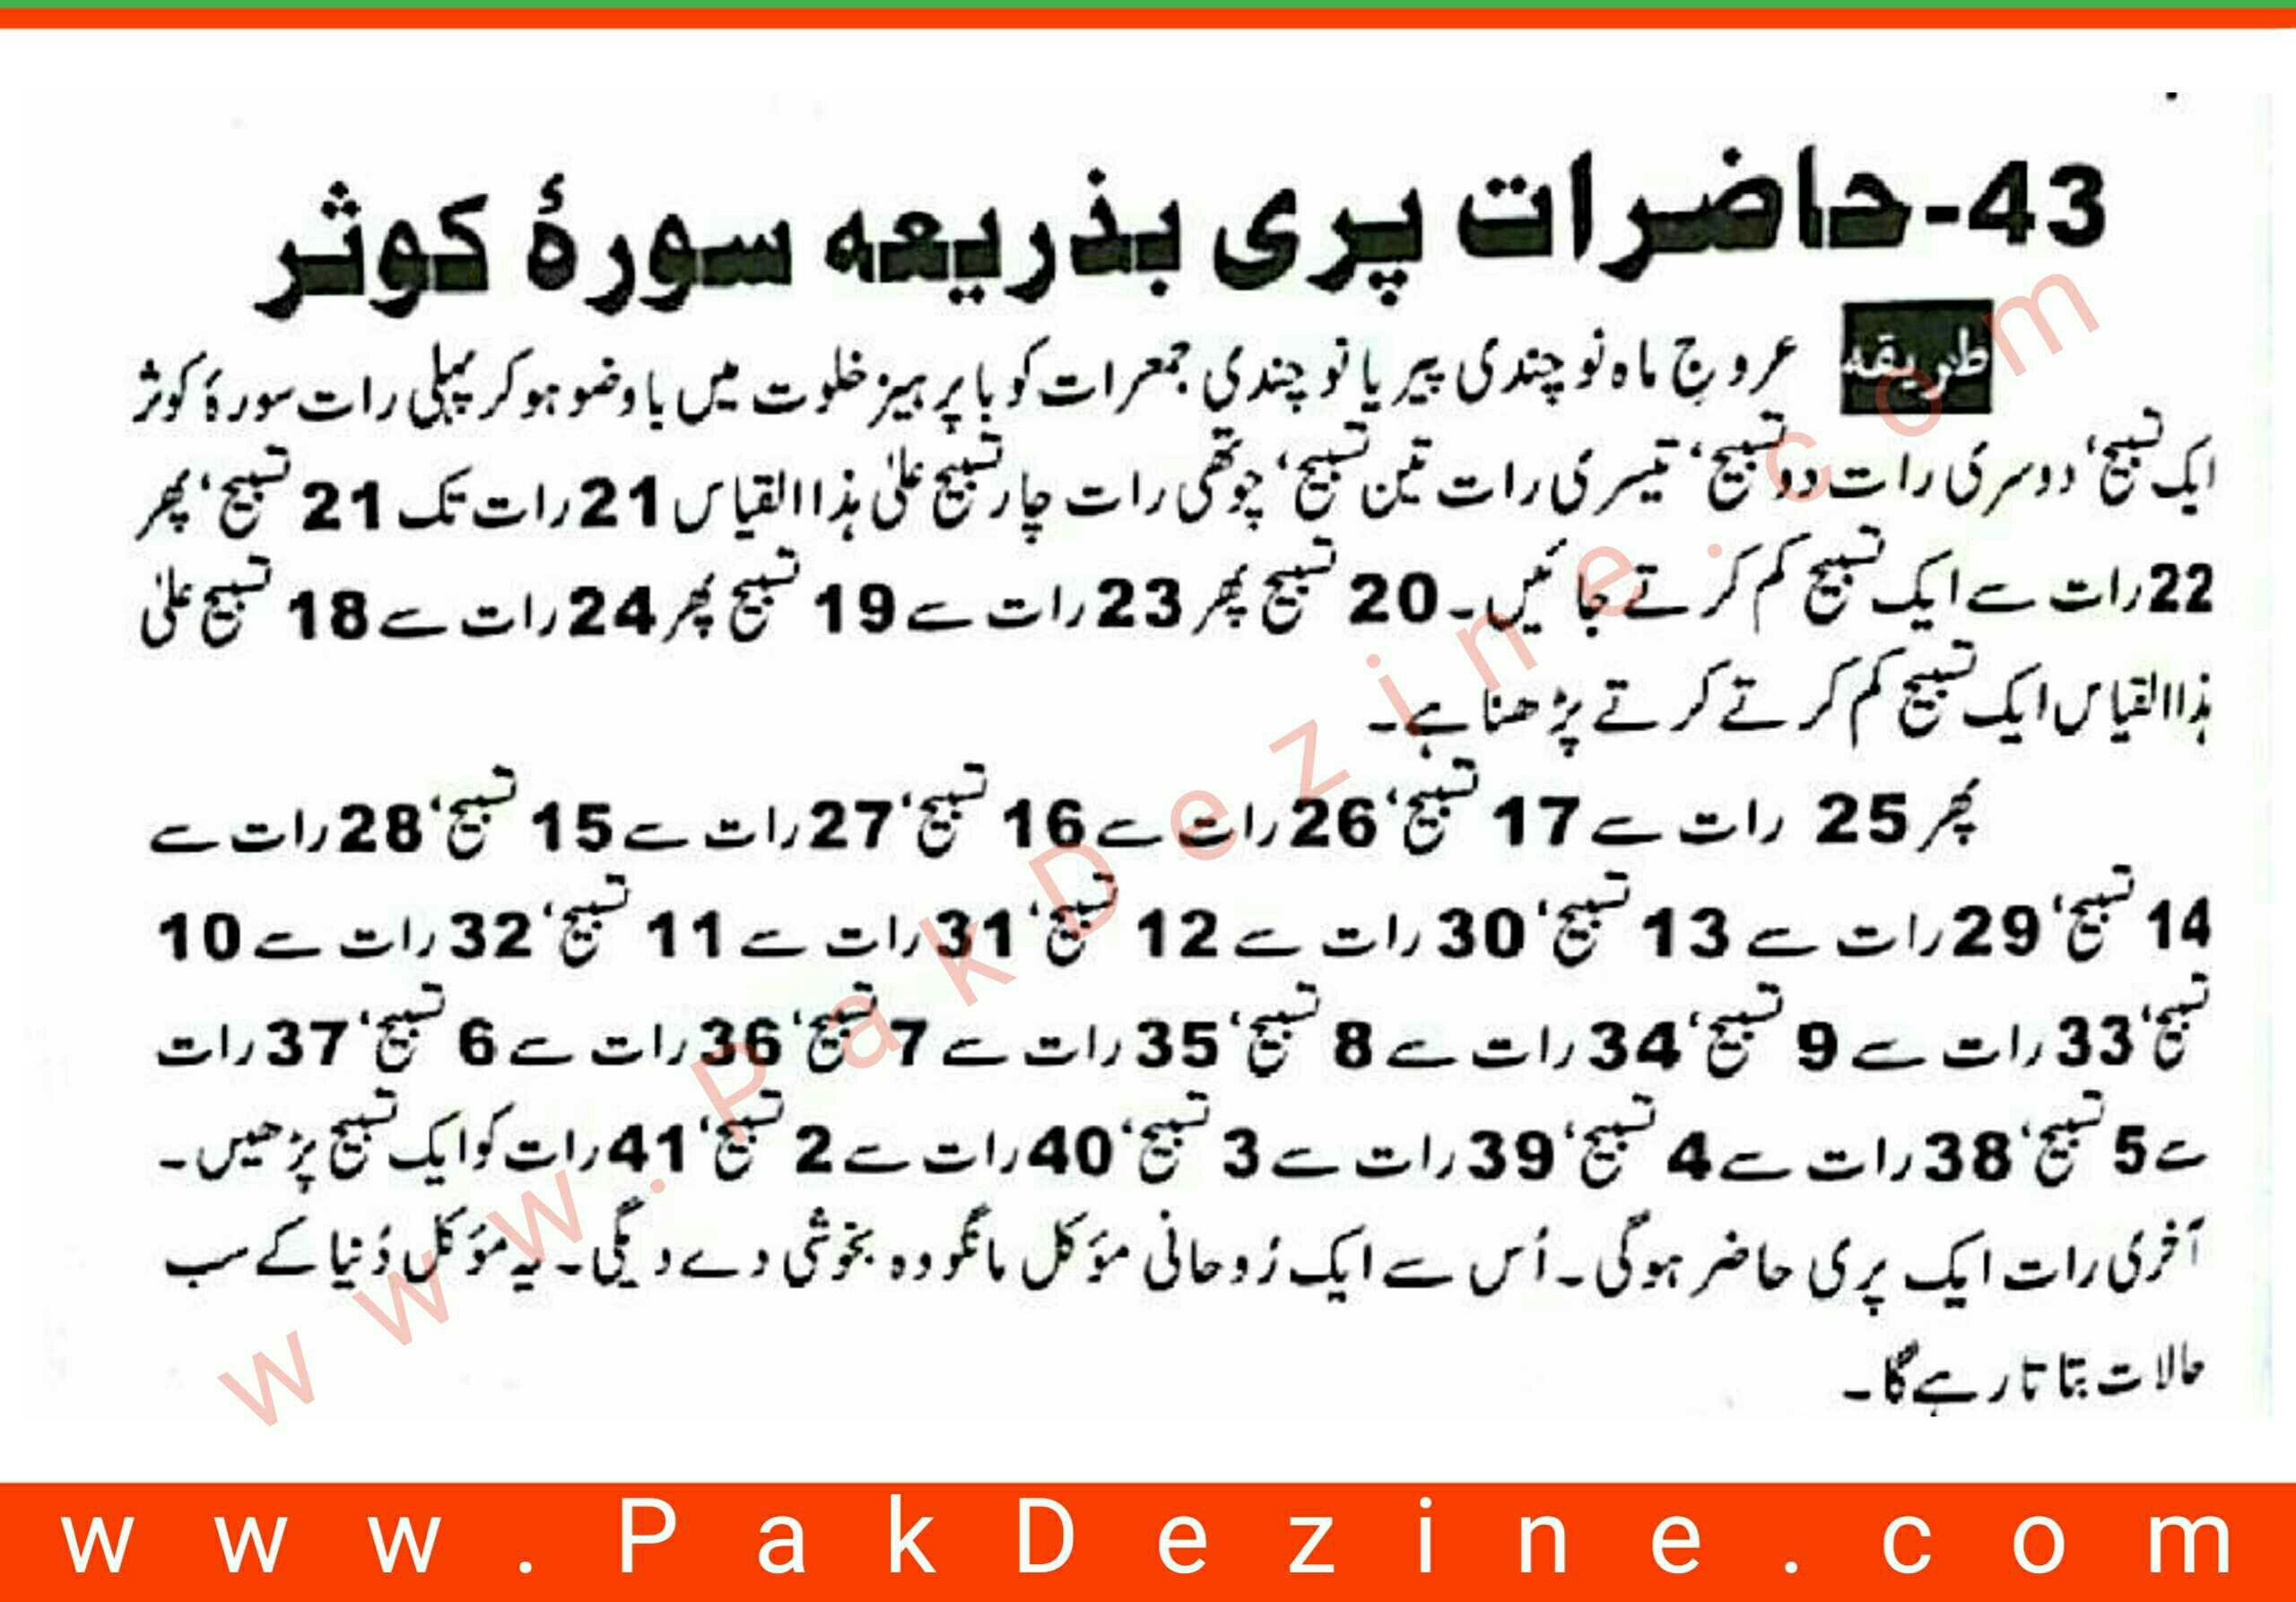 Surah Kausar K Zariye Pari Ko Hazir Karna in Urdu and Hindi